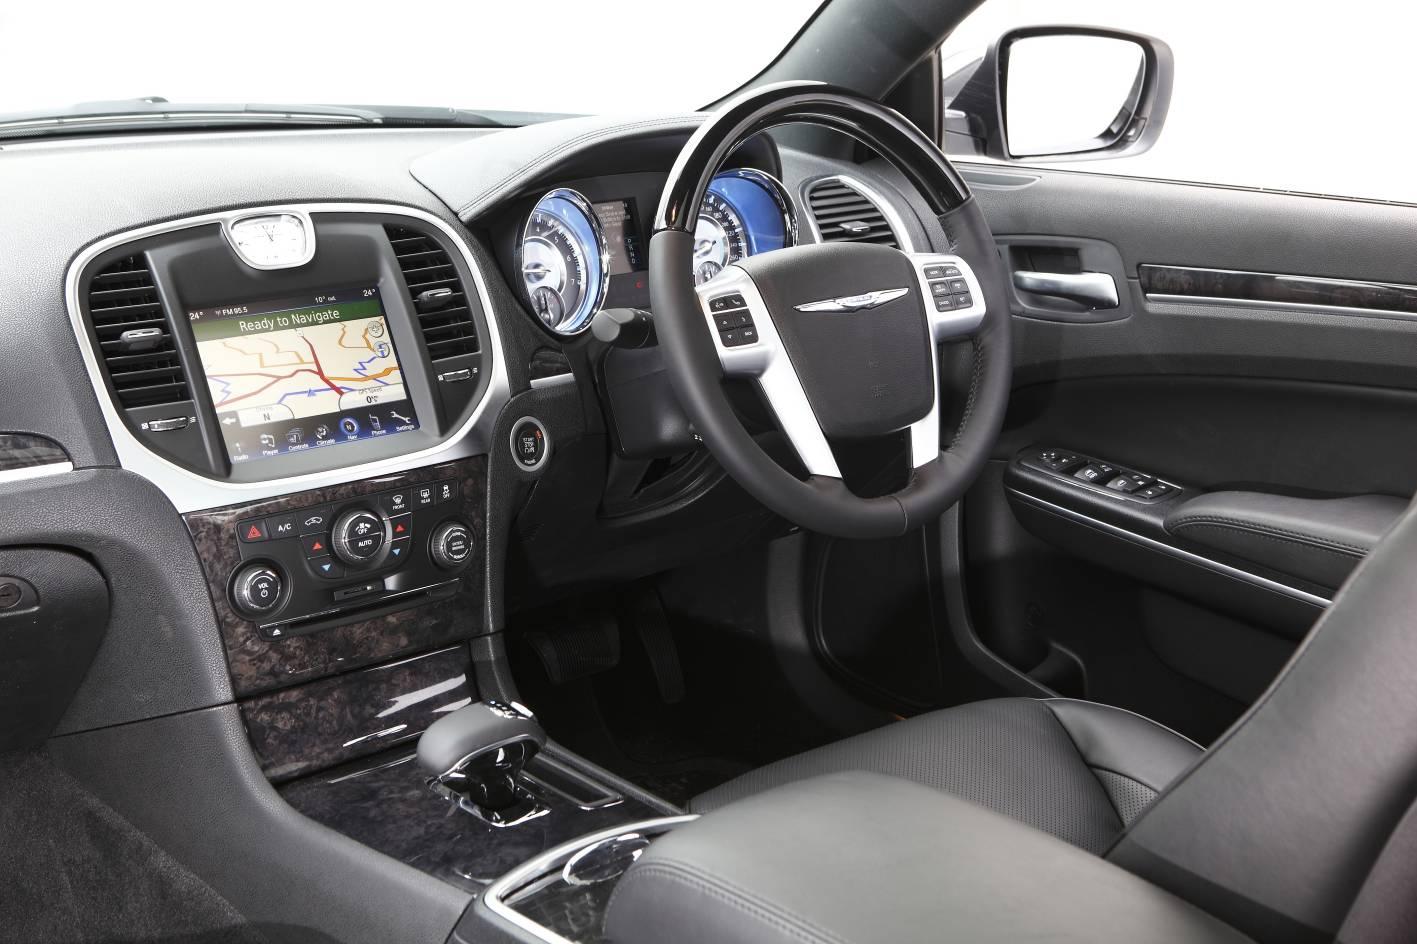 2012 Chrysler 300C interior  